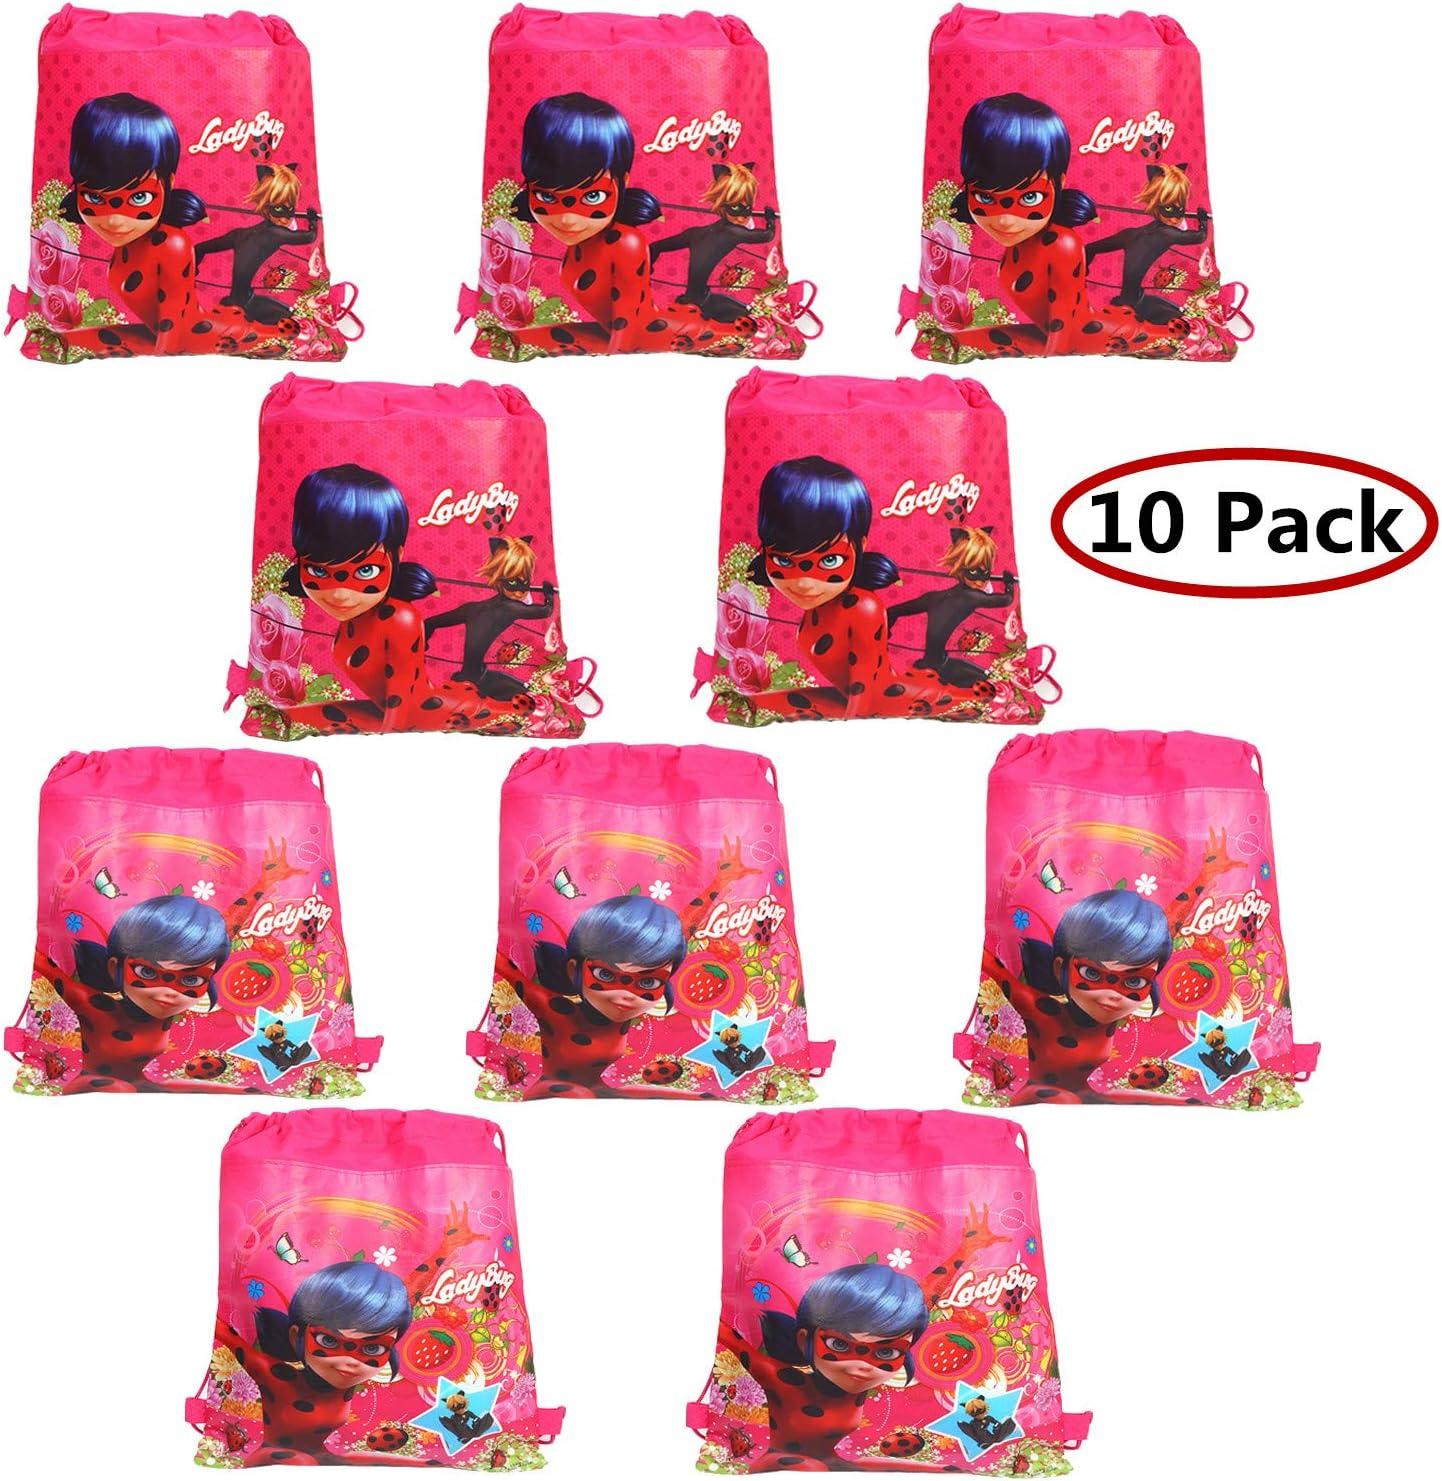 Geenber Ladybug Bolsas de Regalo Paquete de 10 Bolsas de Zapatos ...